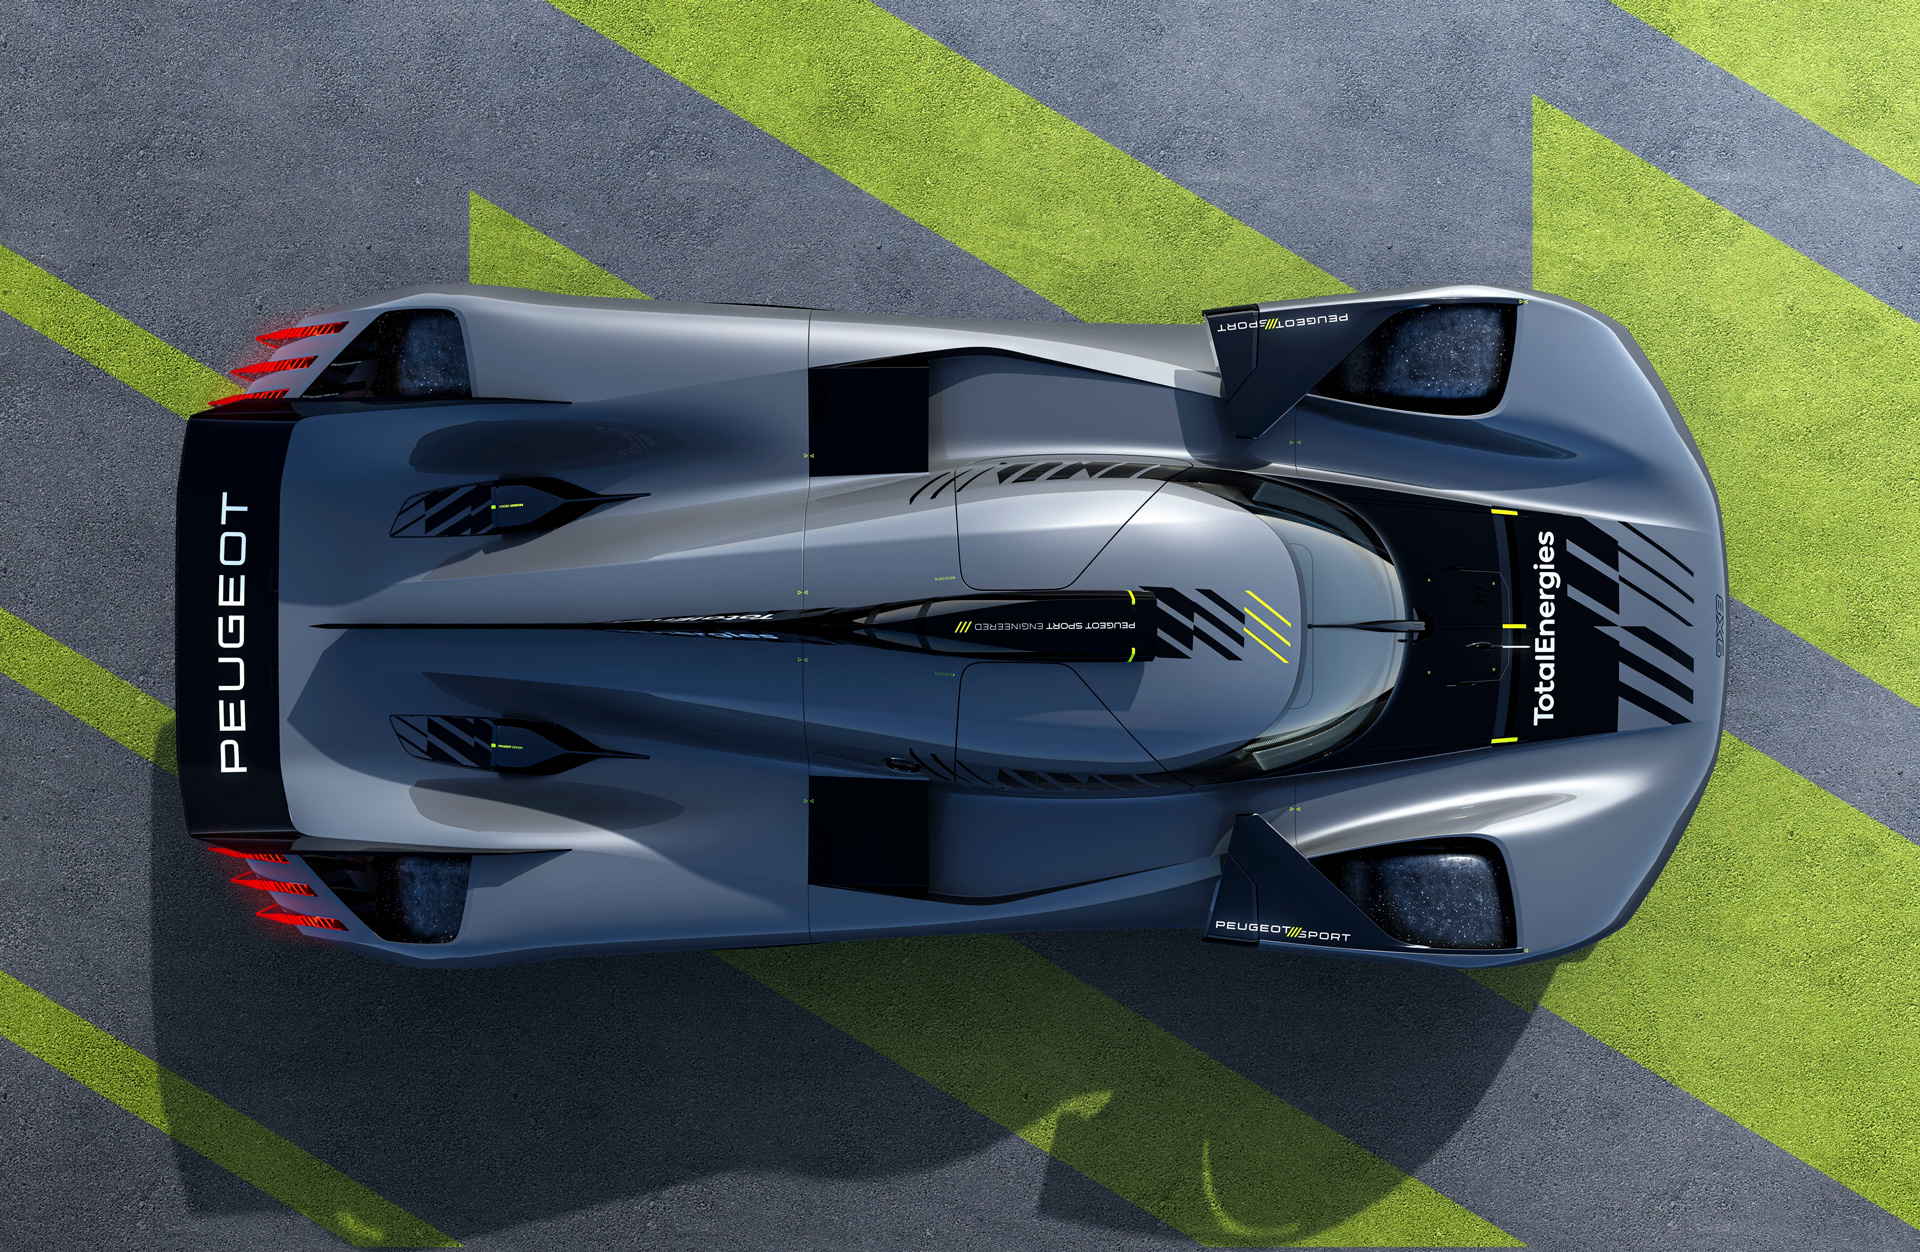 El Peugeot 9x8 debutará en 2022